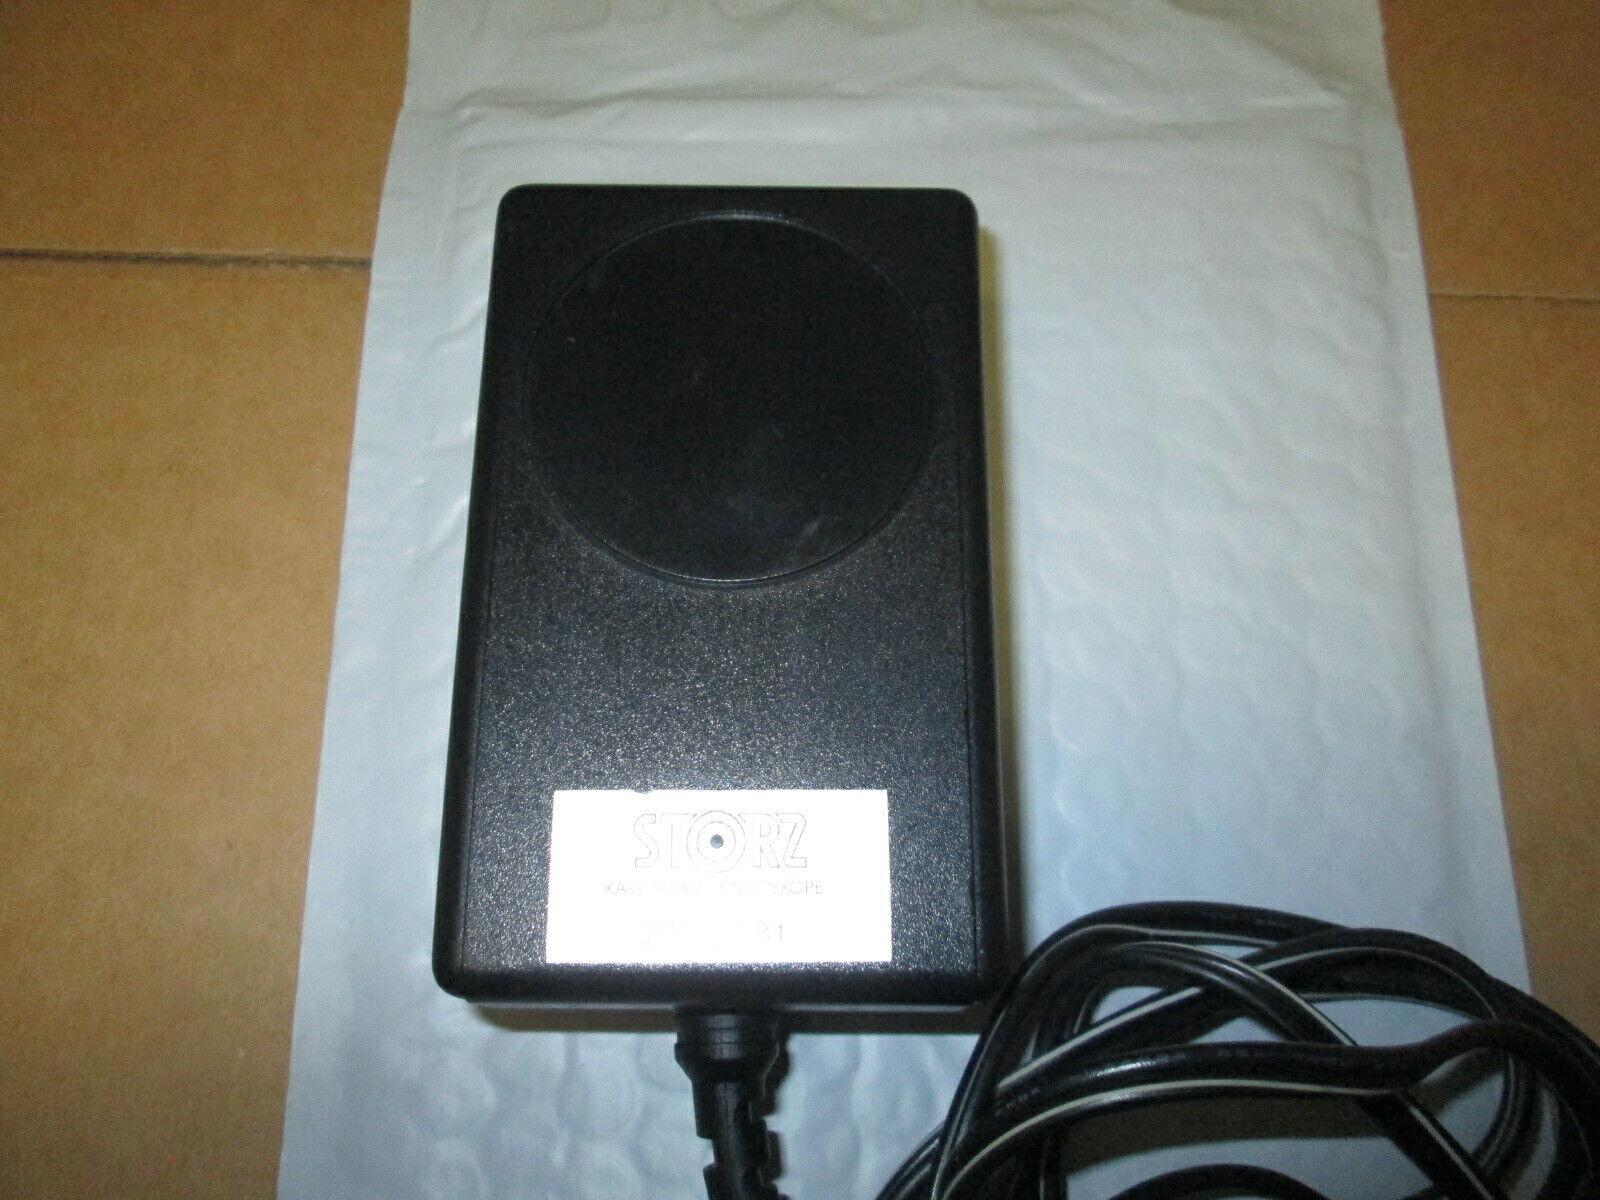 STORZ MEDICAL POWER SUPPLY UNIT MW160 AC ADAPTOR 100-240v 15V 3.0A 4 PIN Ault